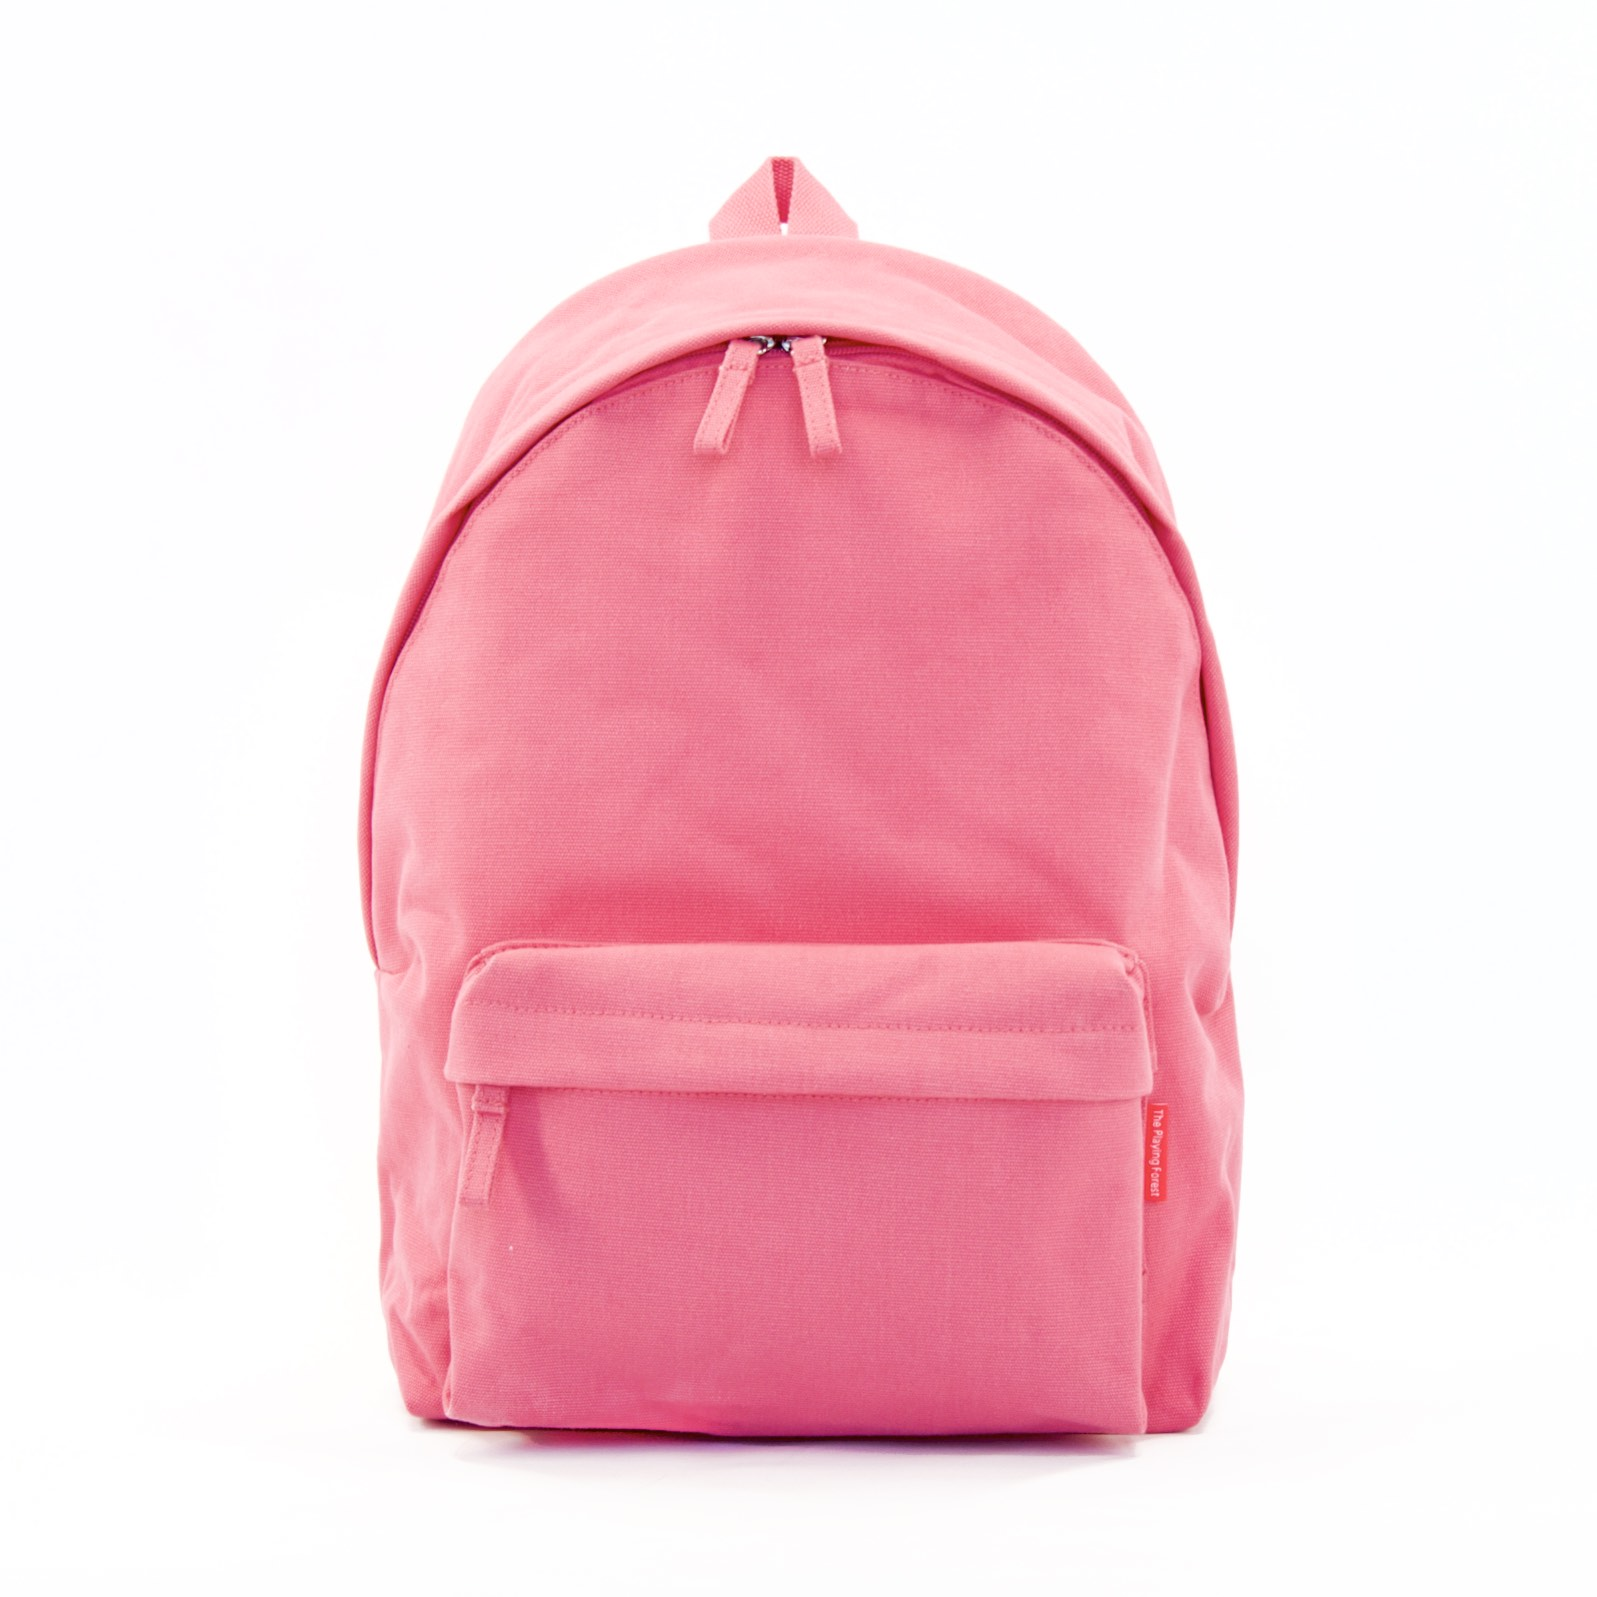 47d59da7c729 Waterproof Heavy Canvas Backpack ( 13.5   15.5 Notebook )   Red ...